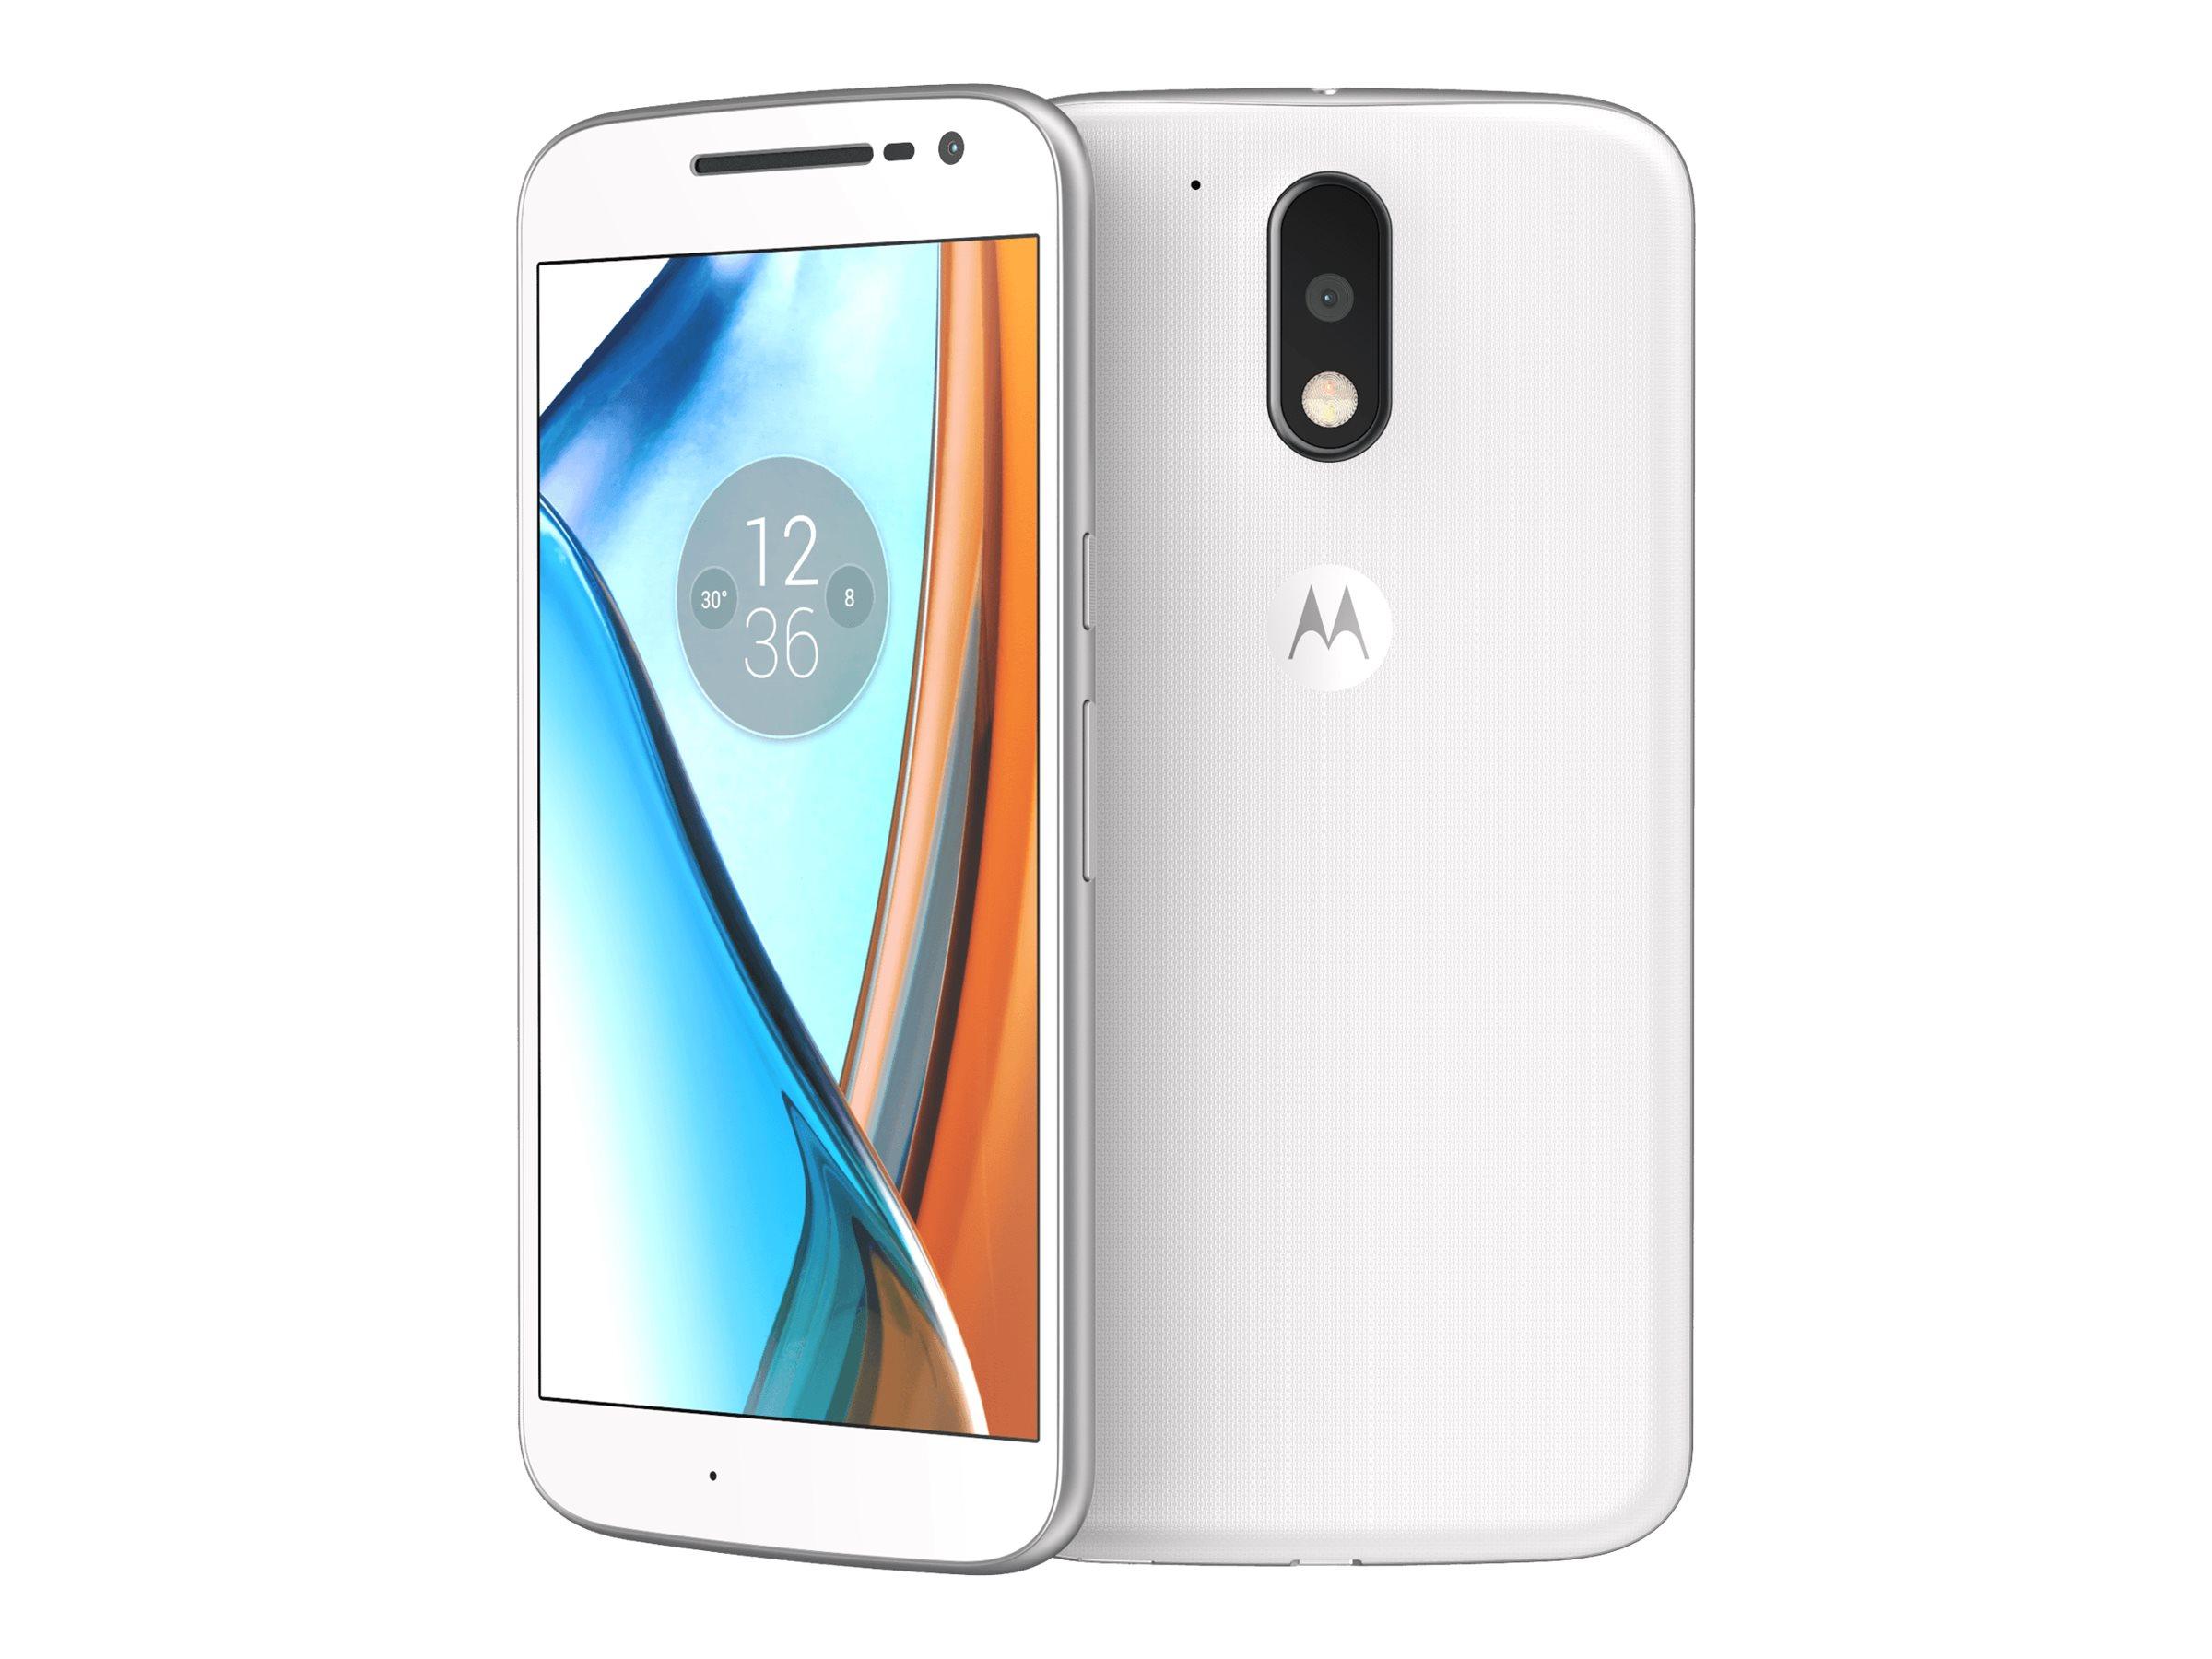 Motorola Moto G4 55 Dual Sim Unlocked 4G Smartphone Octa